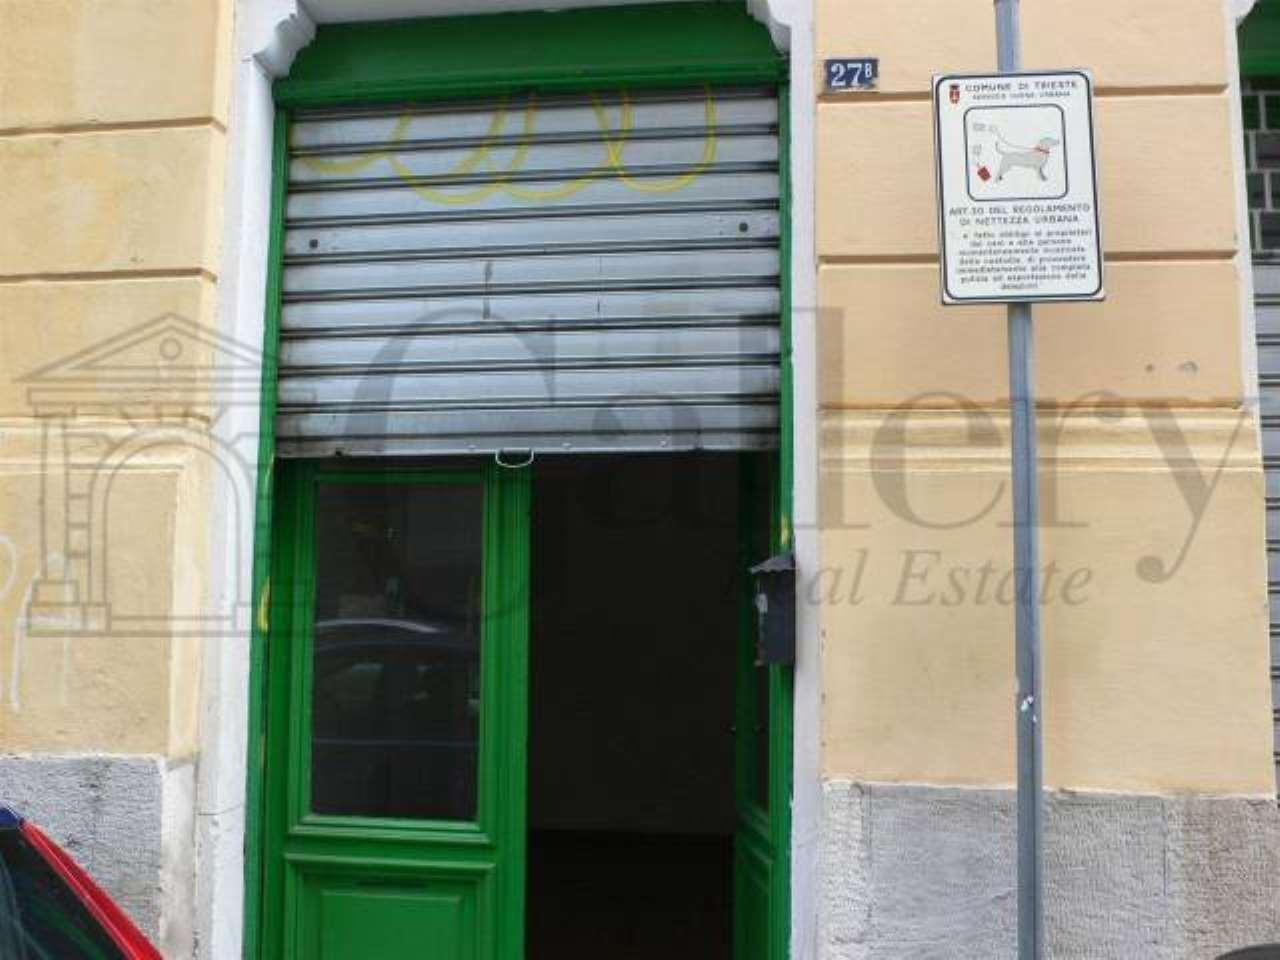 Immobile Commerciale in vendita a Trieste-http://media.getrix.it/1/6809/2577759722.jpg